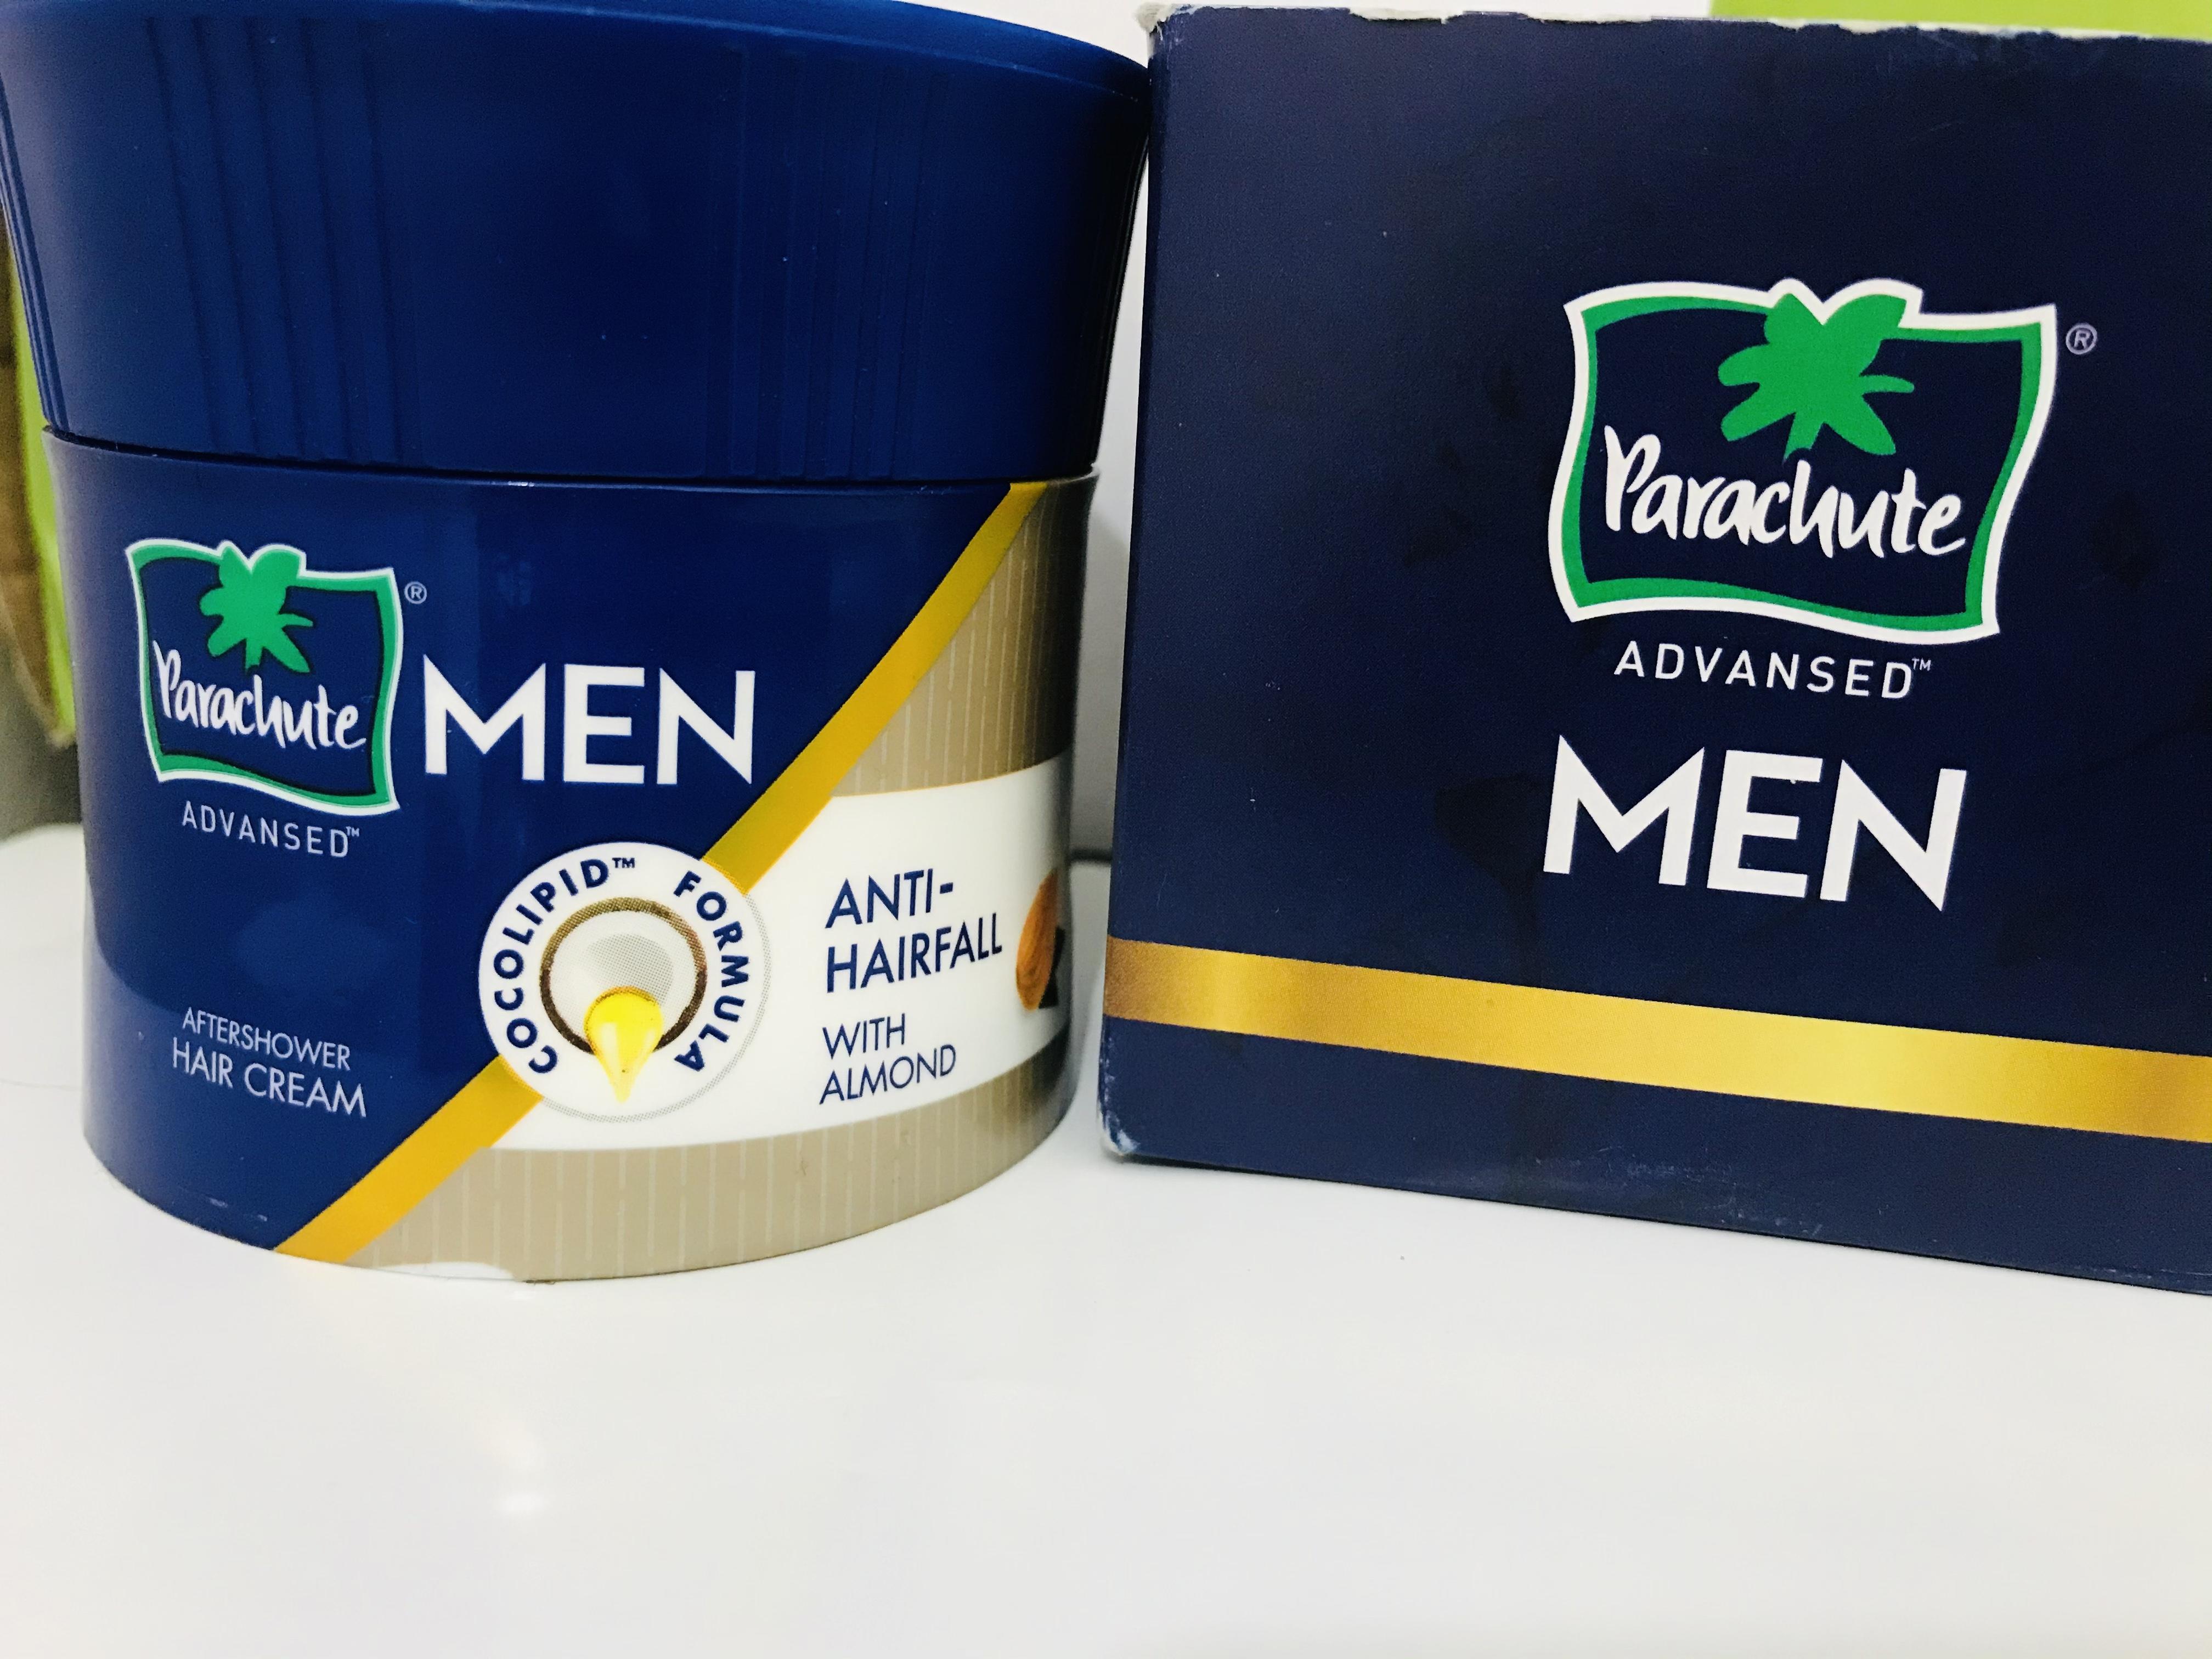 Parachute Advansed Men Anti Hairfall Hair Cream, With Almond Oil pic 3-Perfect product-By pawan_sharma